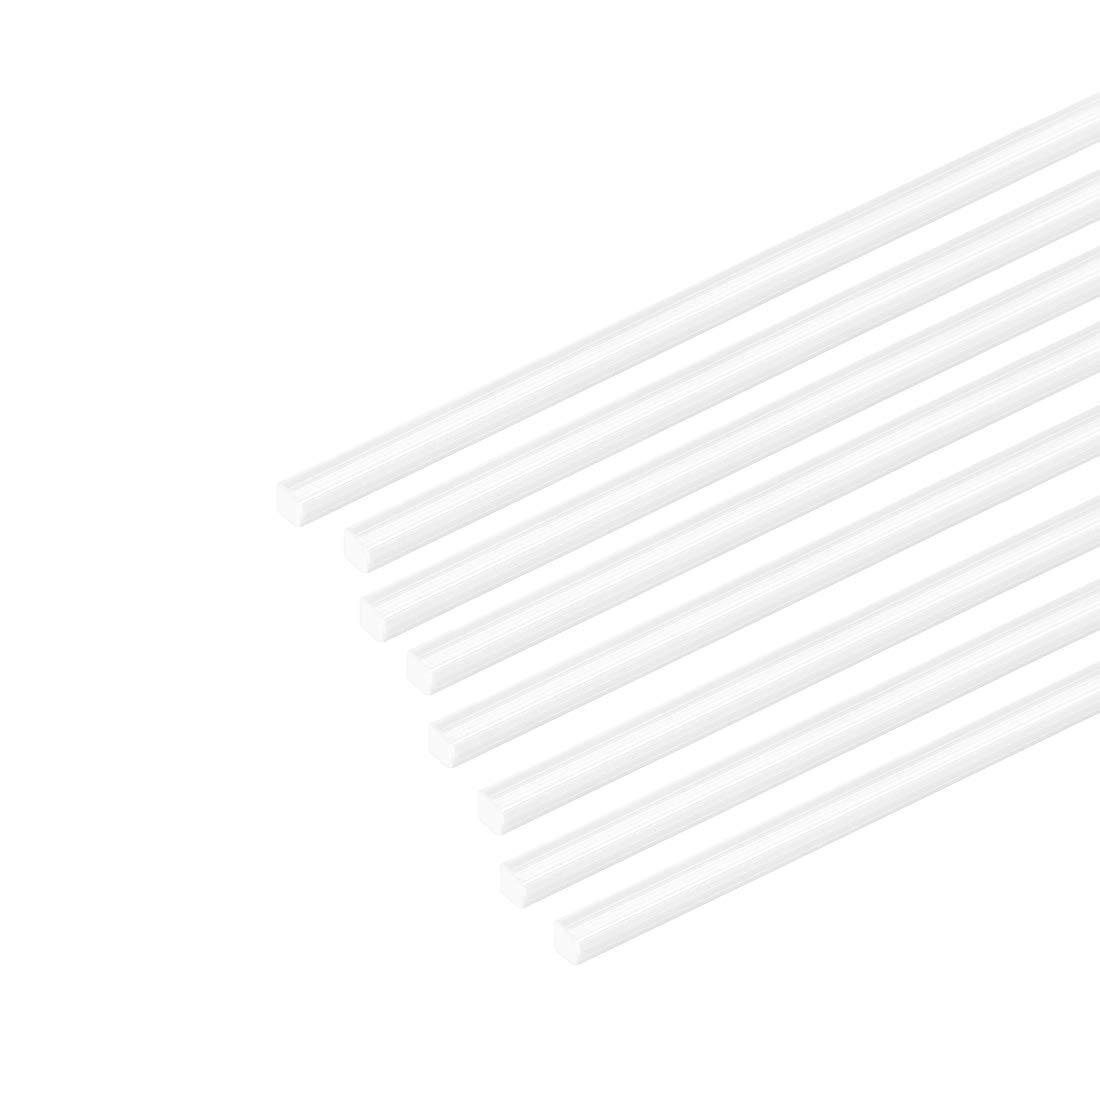 sourcing map 5 Stk Vierkantstange Stab f Architekturmodellbau ABS Kunststoff 0,5mm/×0,5mm/×20